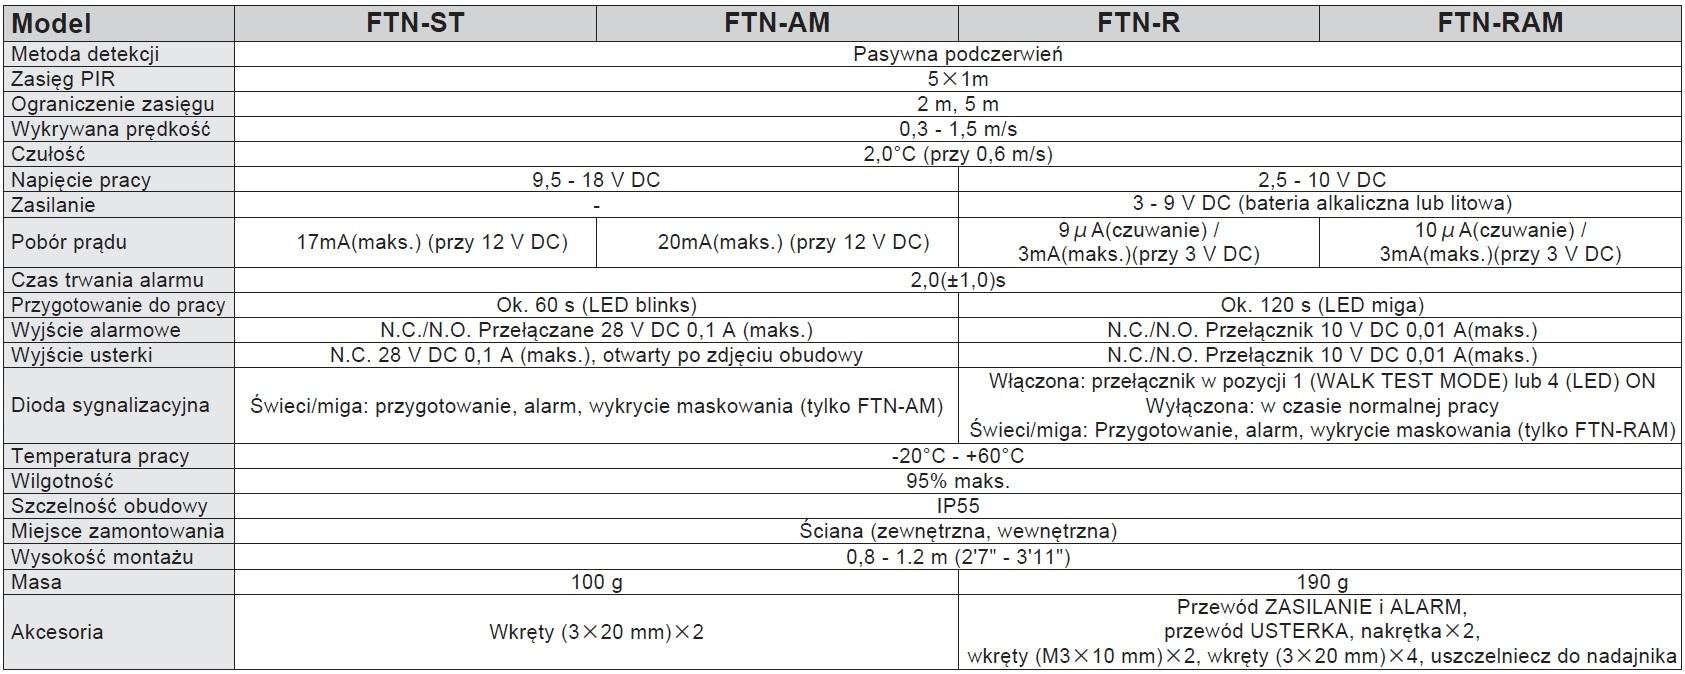 Optex Ftn Seria Specyfikacja Pl